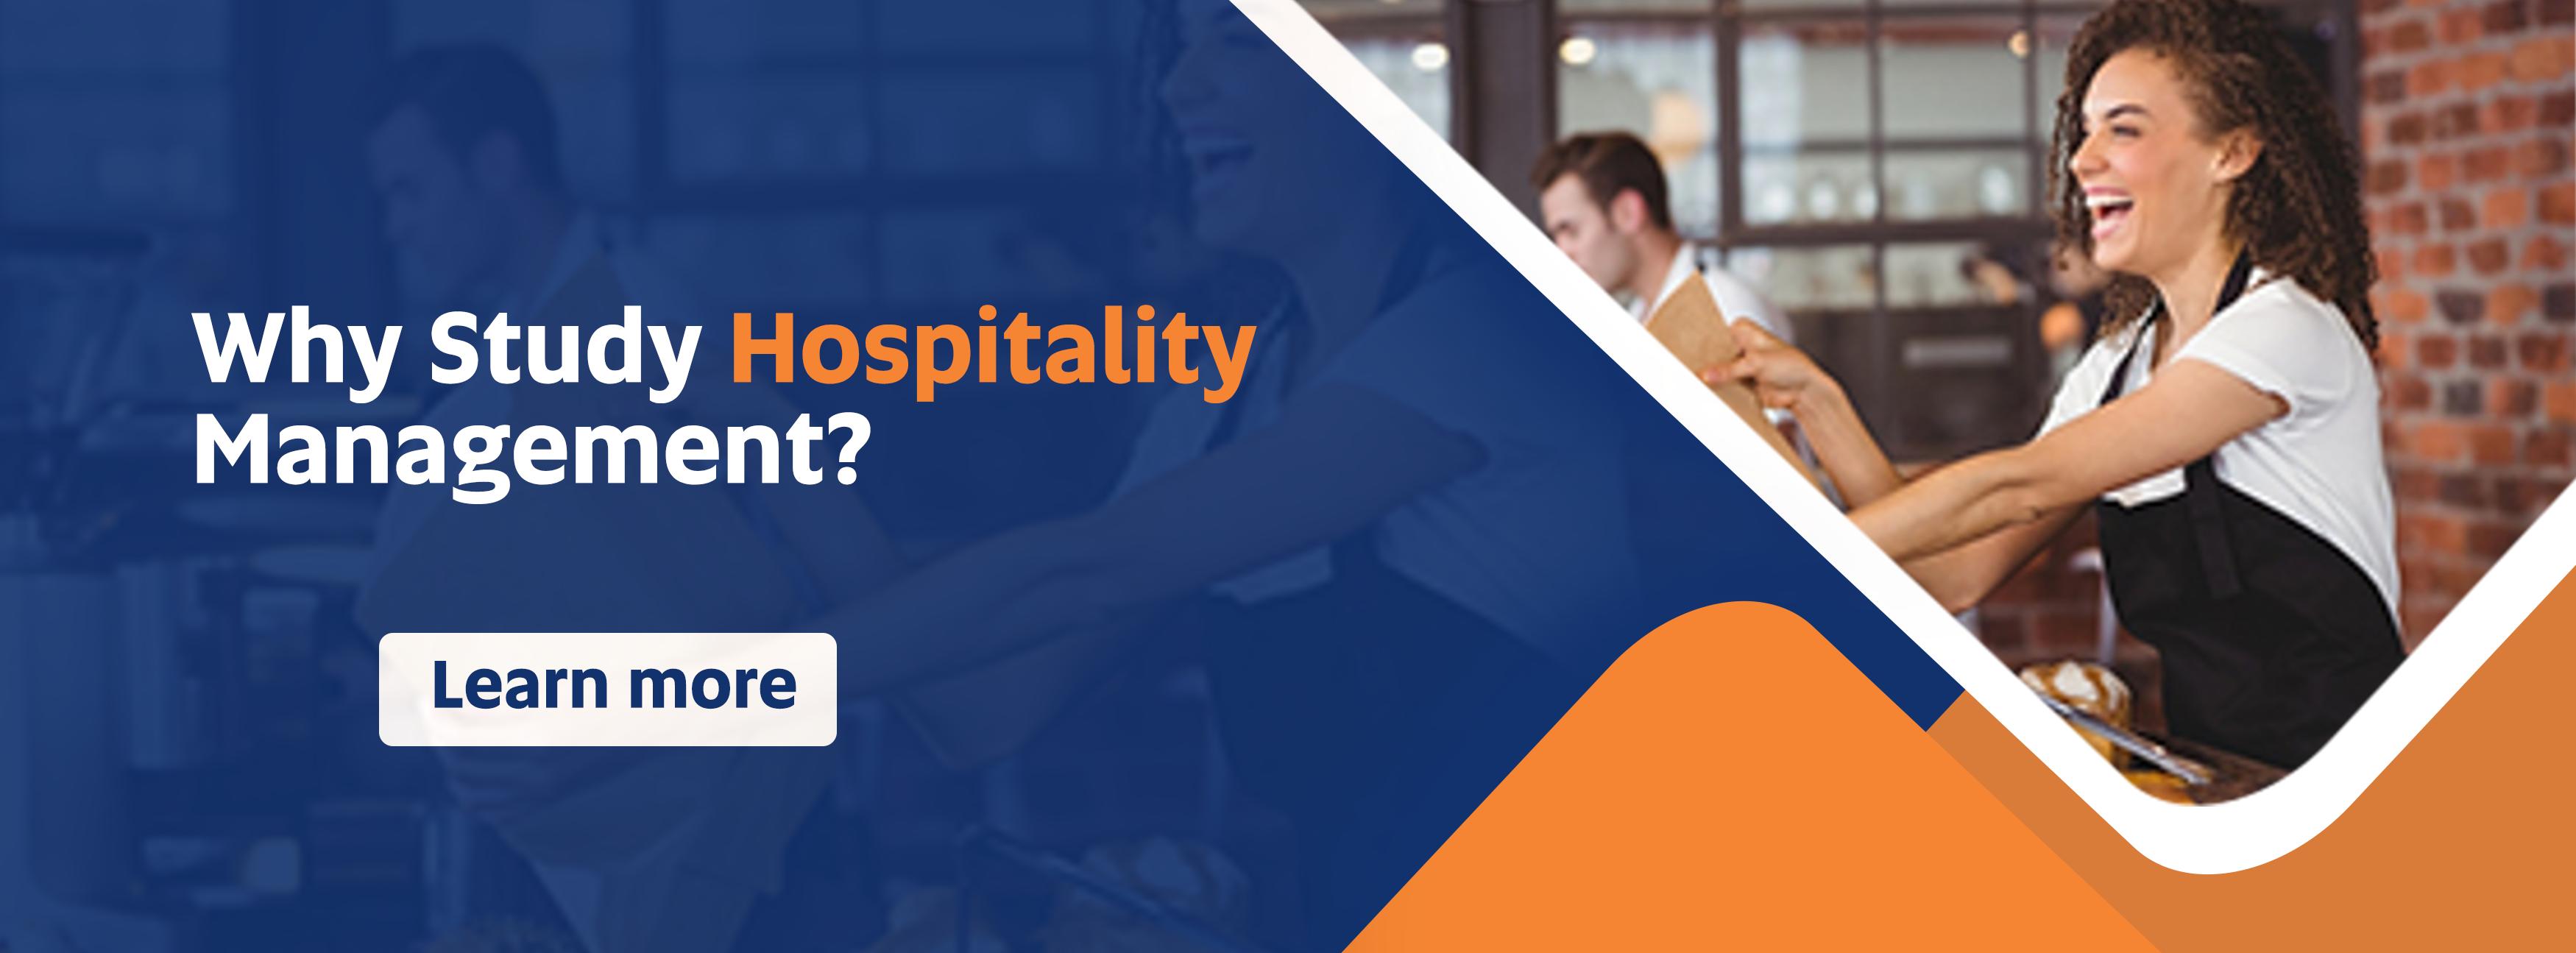 Why Study Hospitality Management